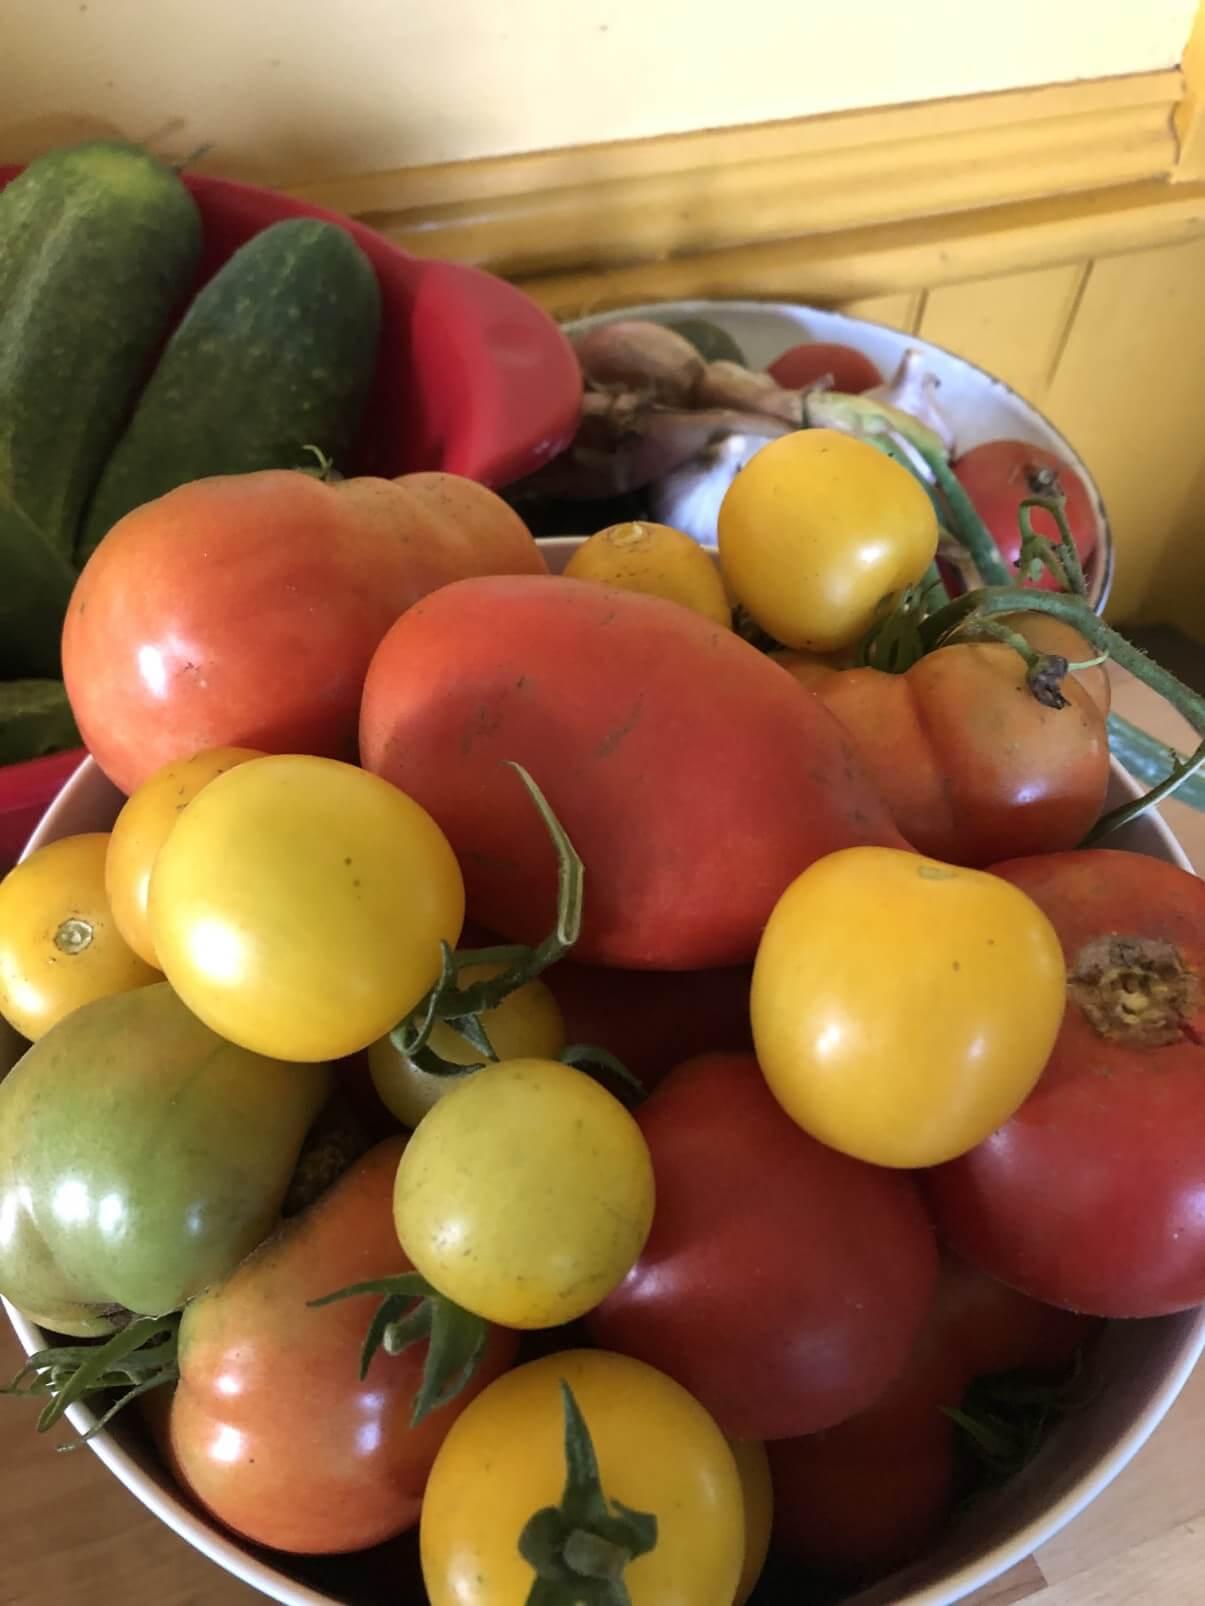 harvested garden produce